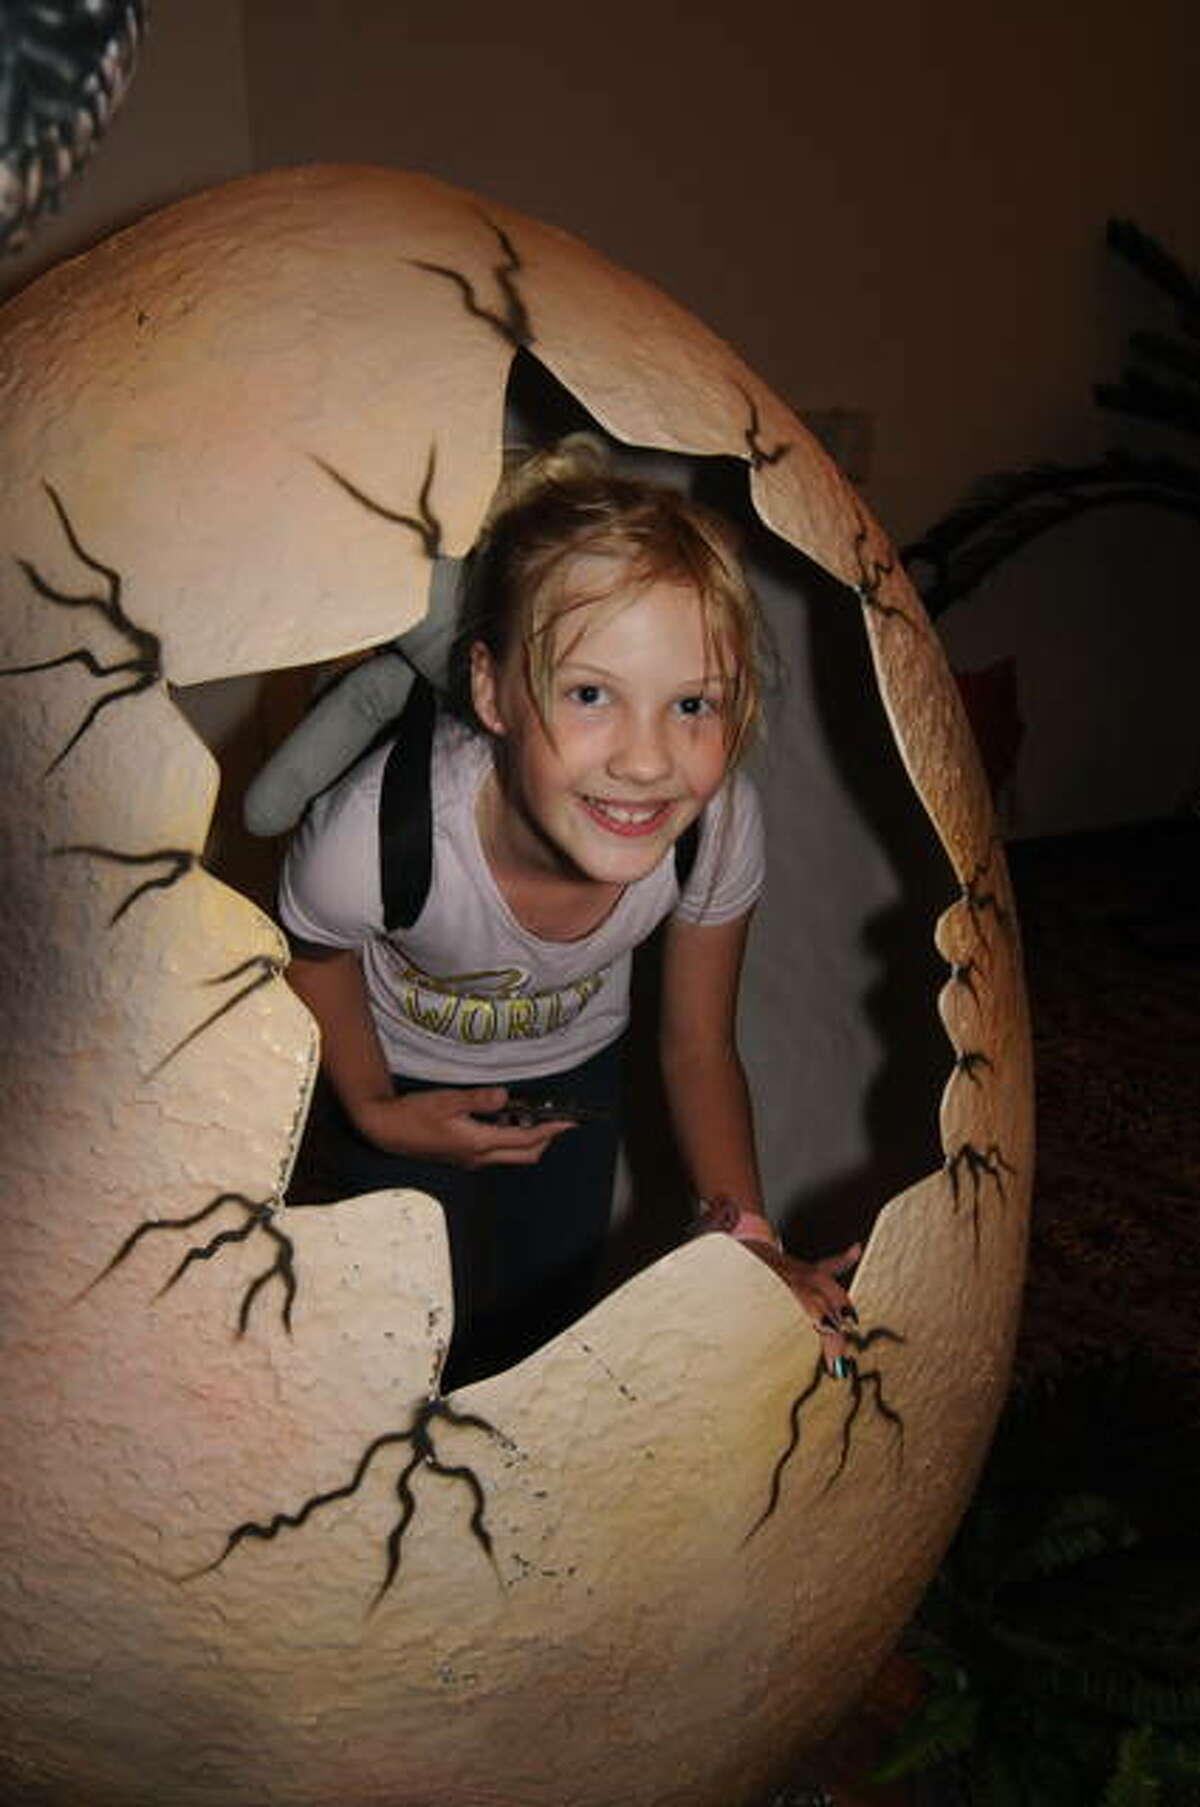 Nine-year-old Dakota Goodwin of Roseburg, Oregon, poses inside a dinosaur egg during the Dino Stroll in Collinsville Saturday.